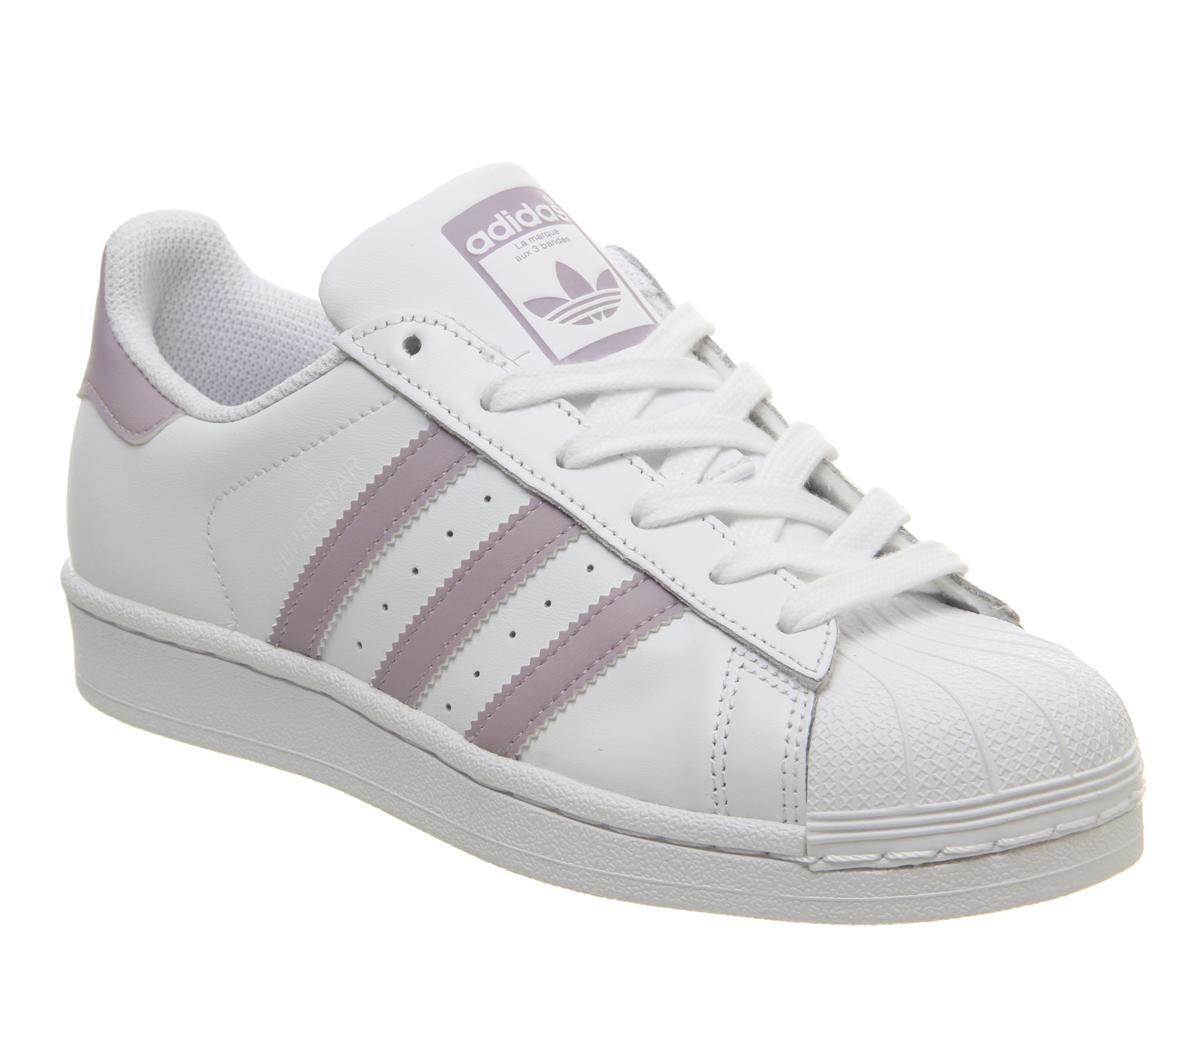 adidas Superstar 1 Trainers White Soft